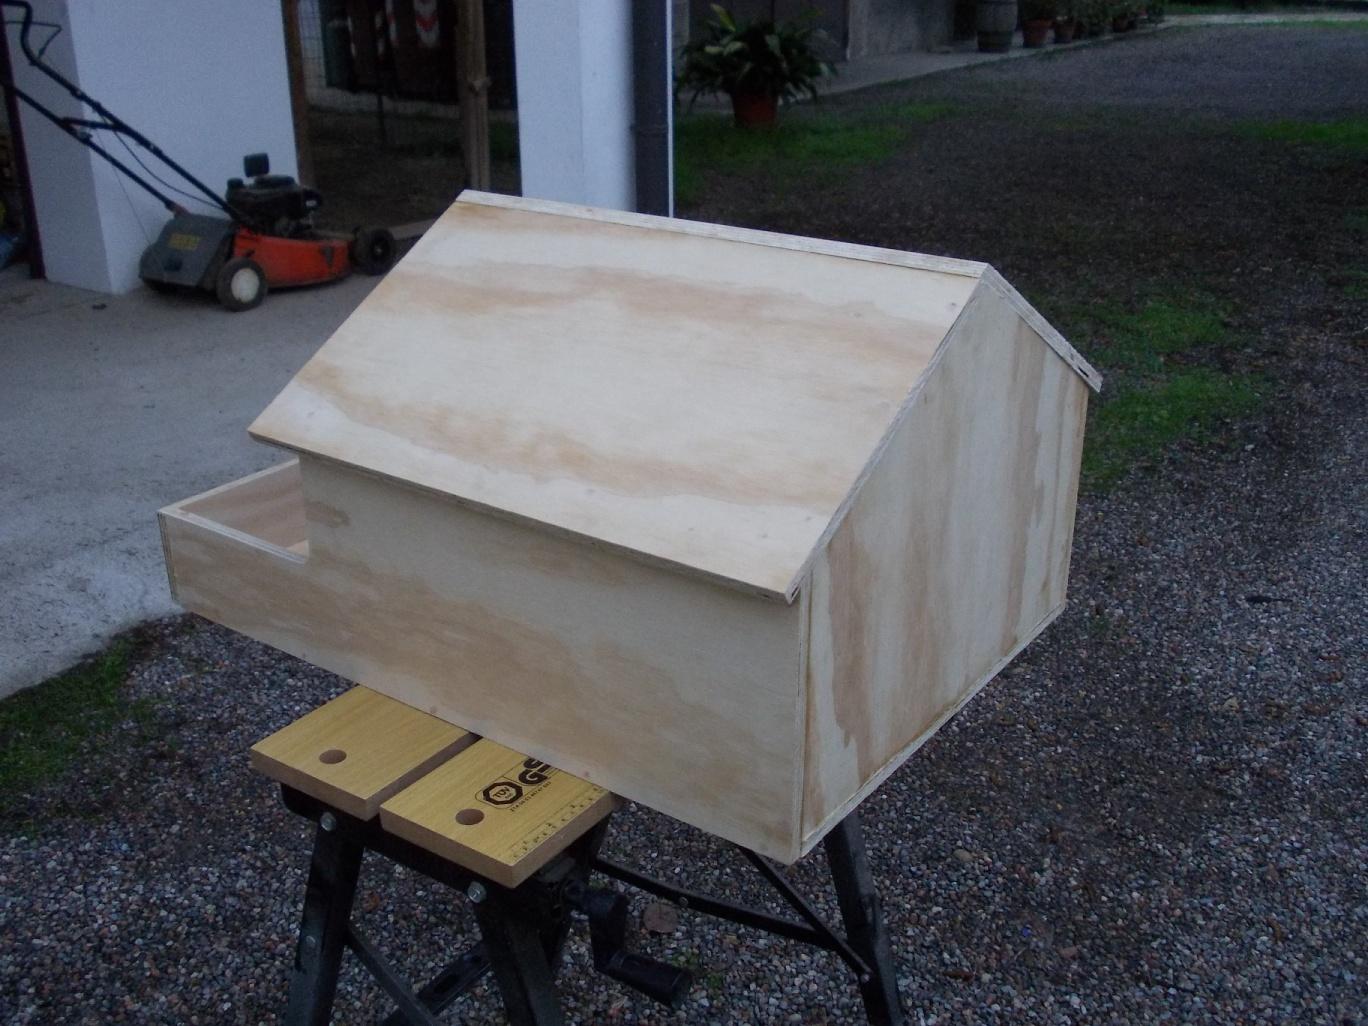 Storie di legno for Vasche di plastica per tartarughe